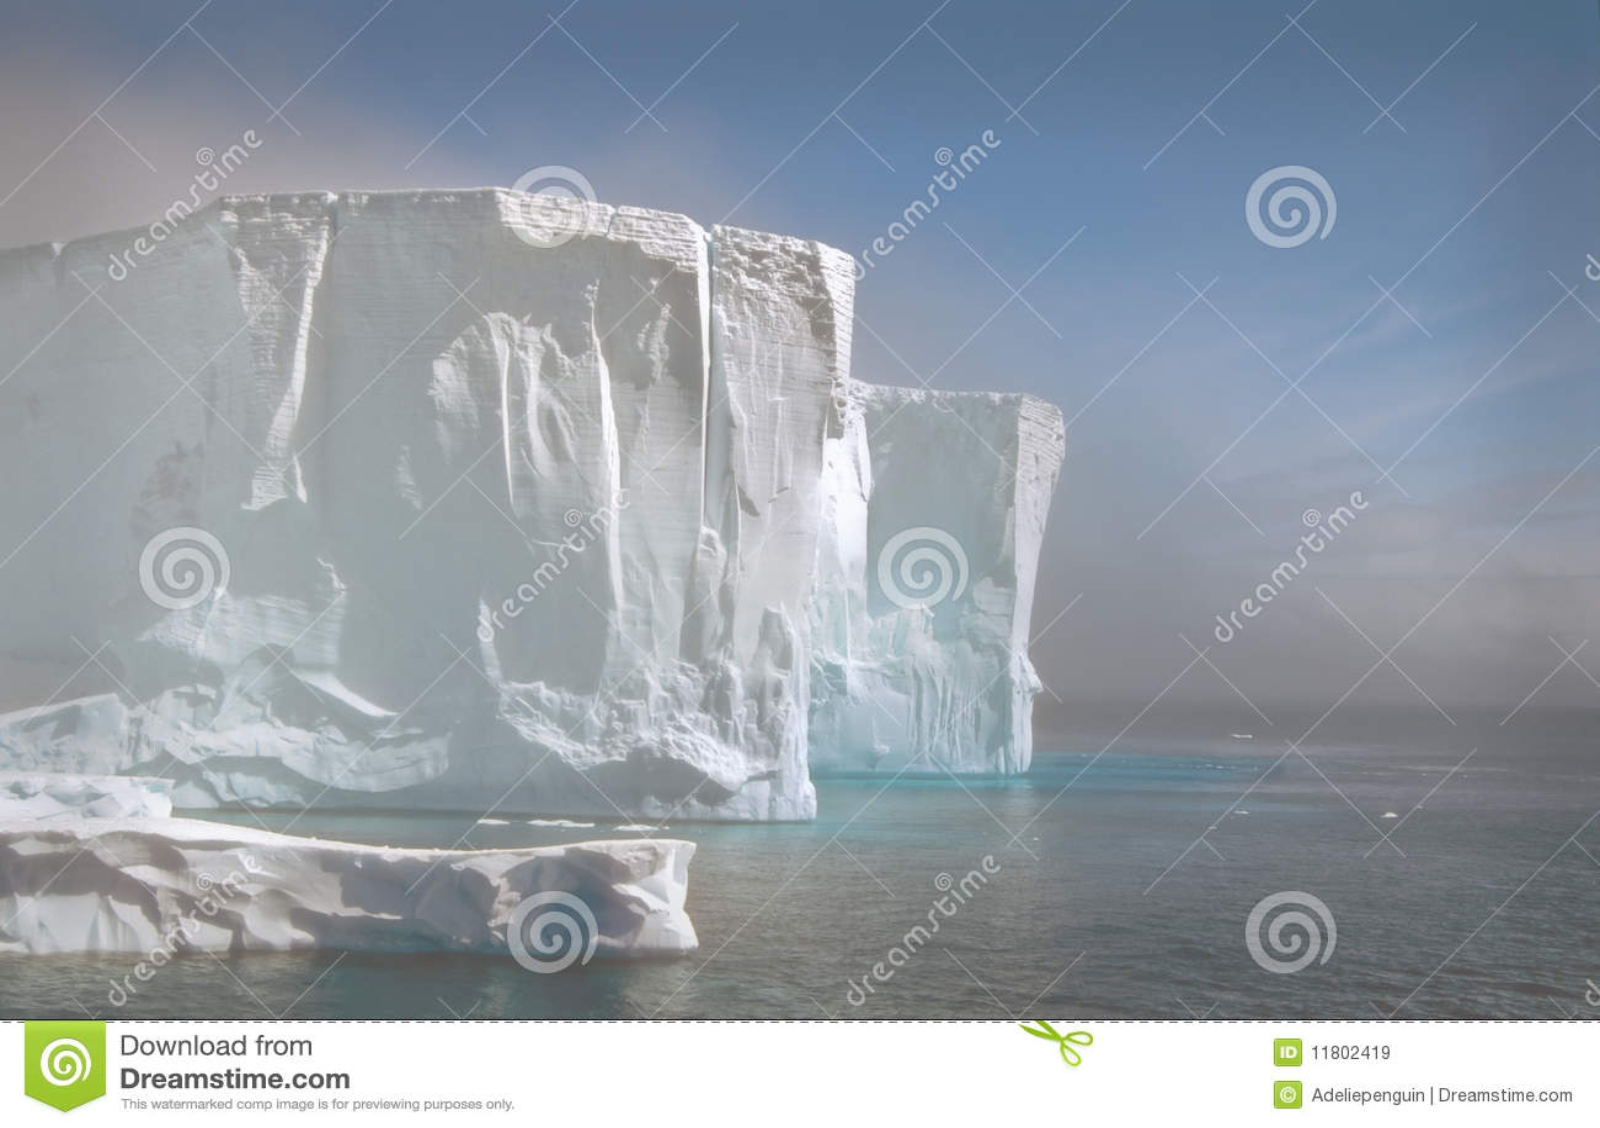 Iceberg in the Fog, Antarctica